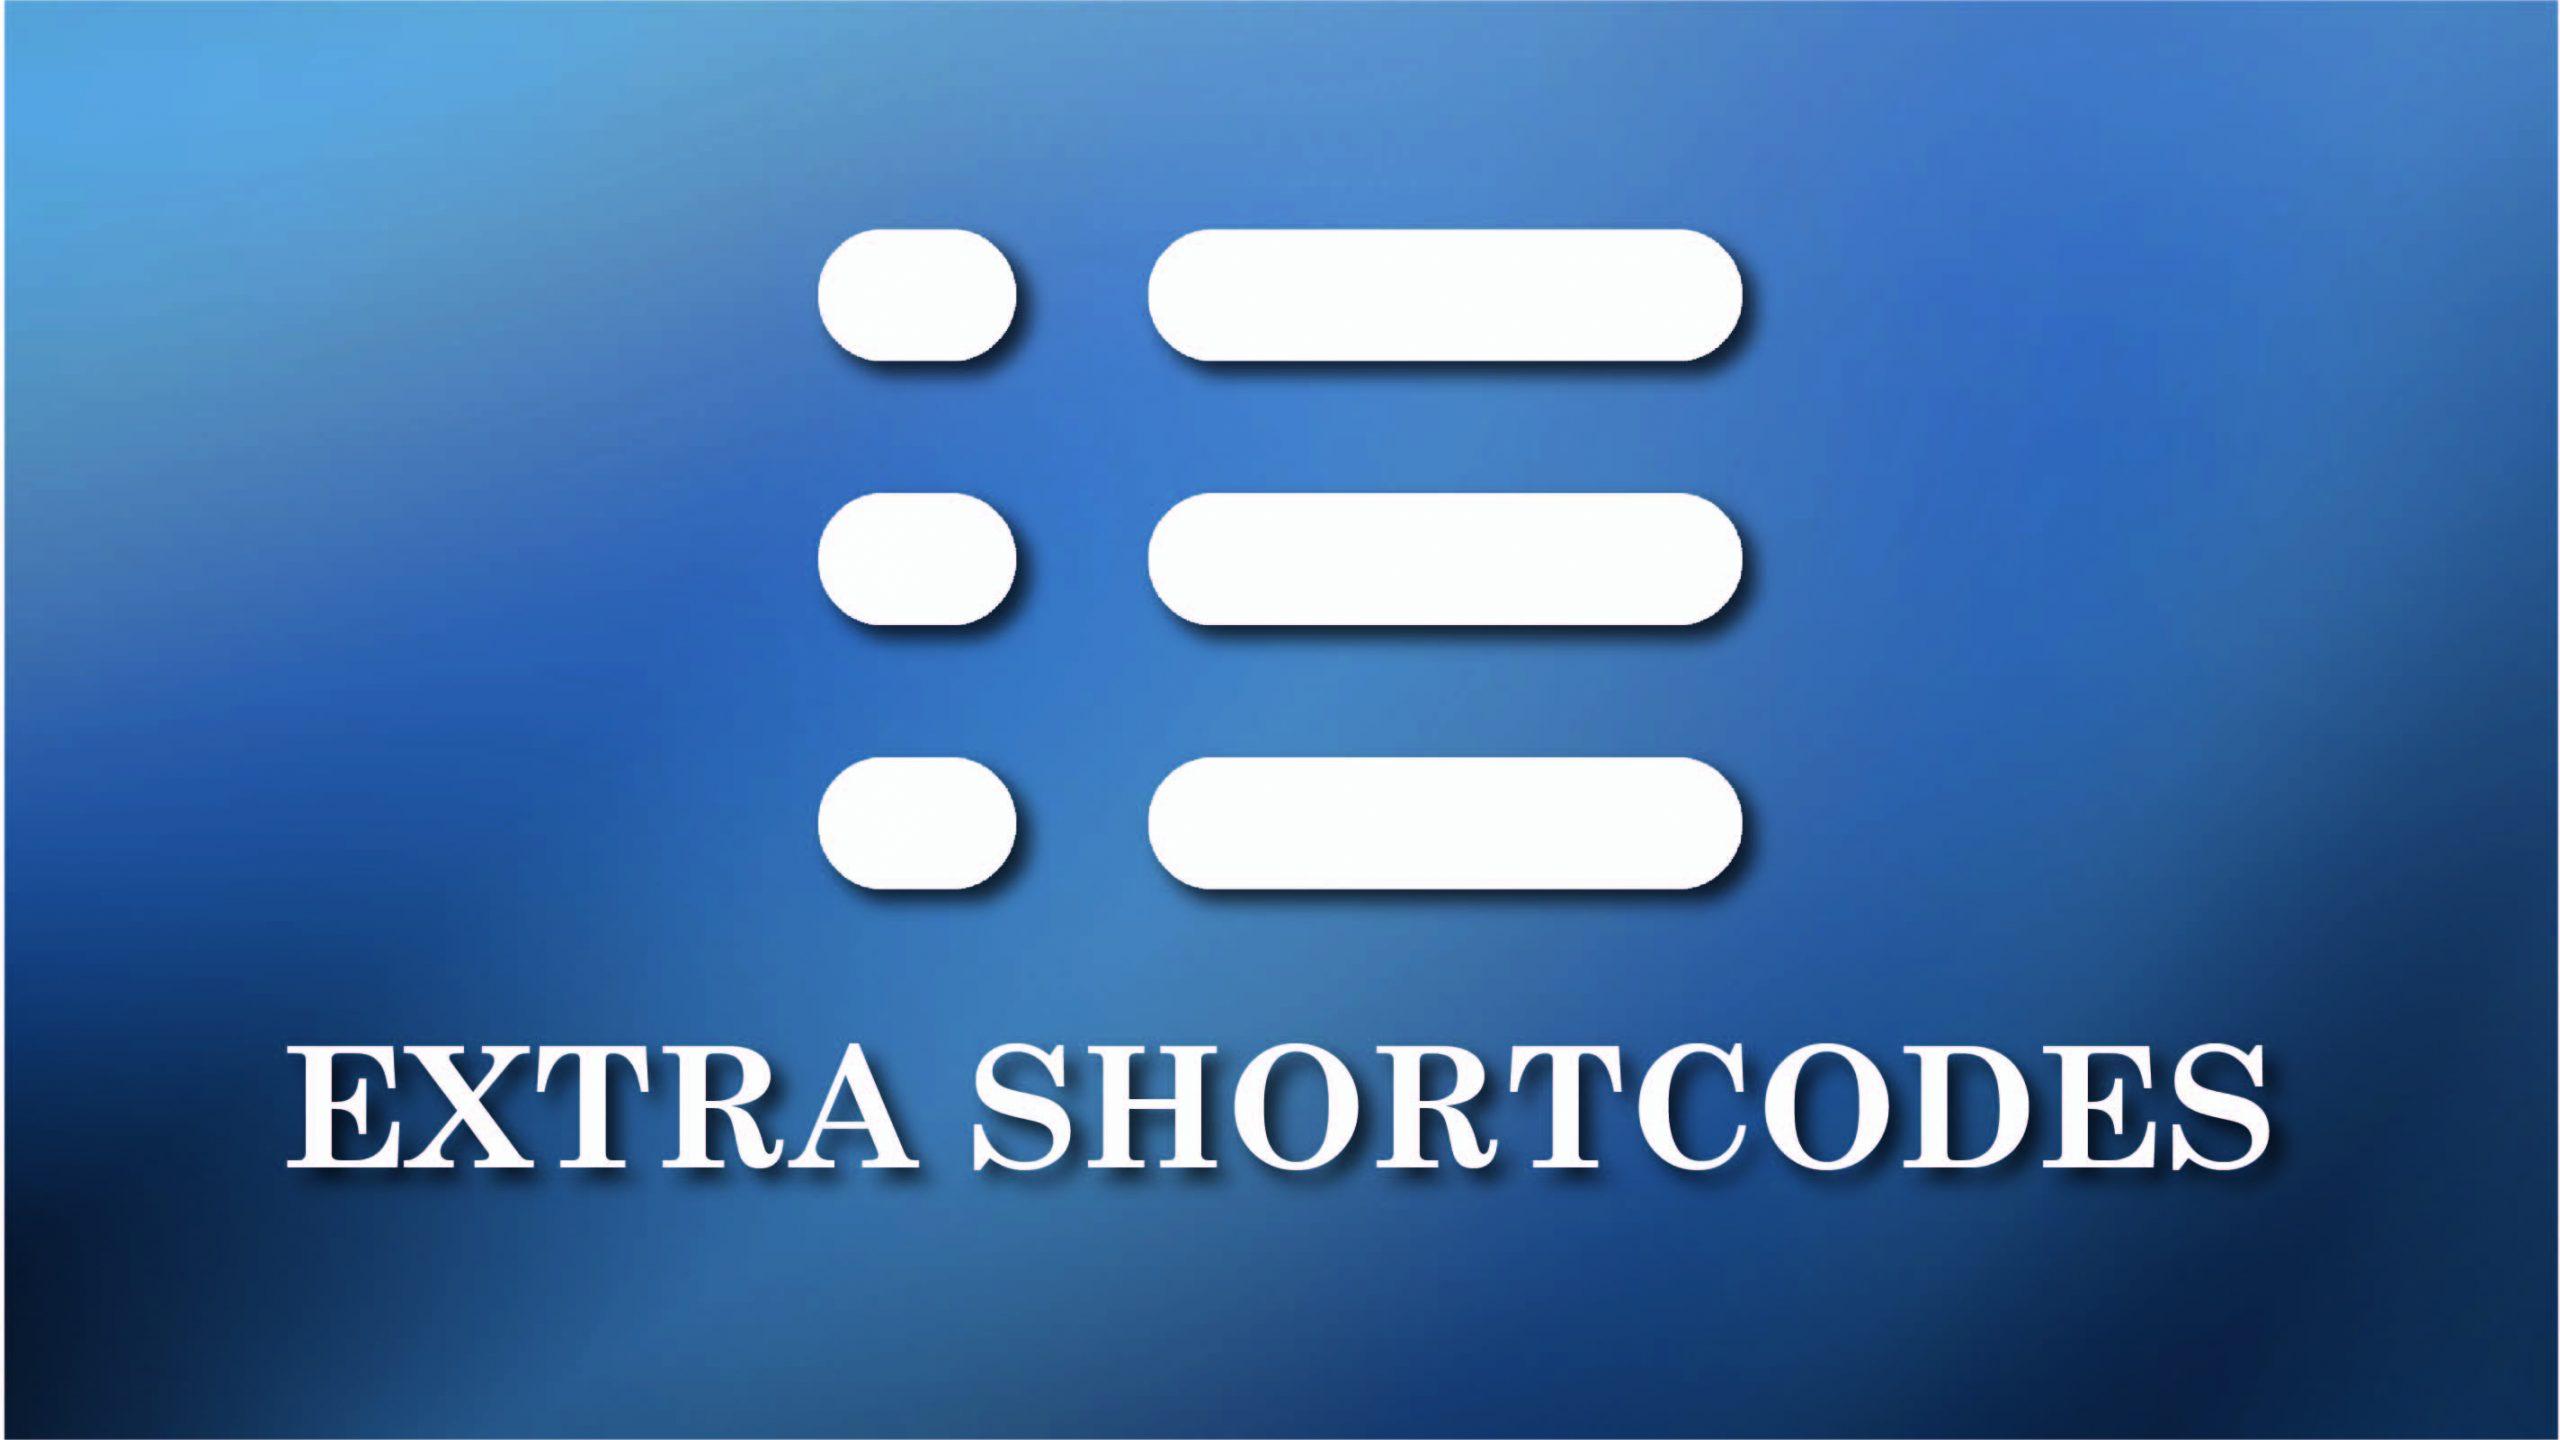 Extra shortcodes